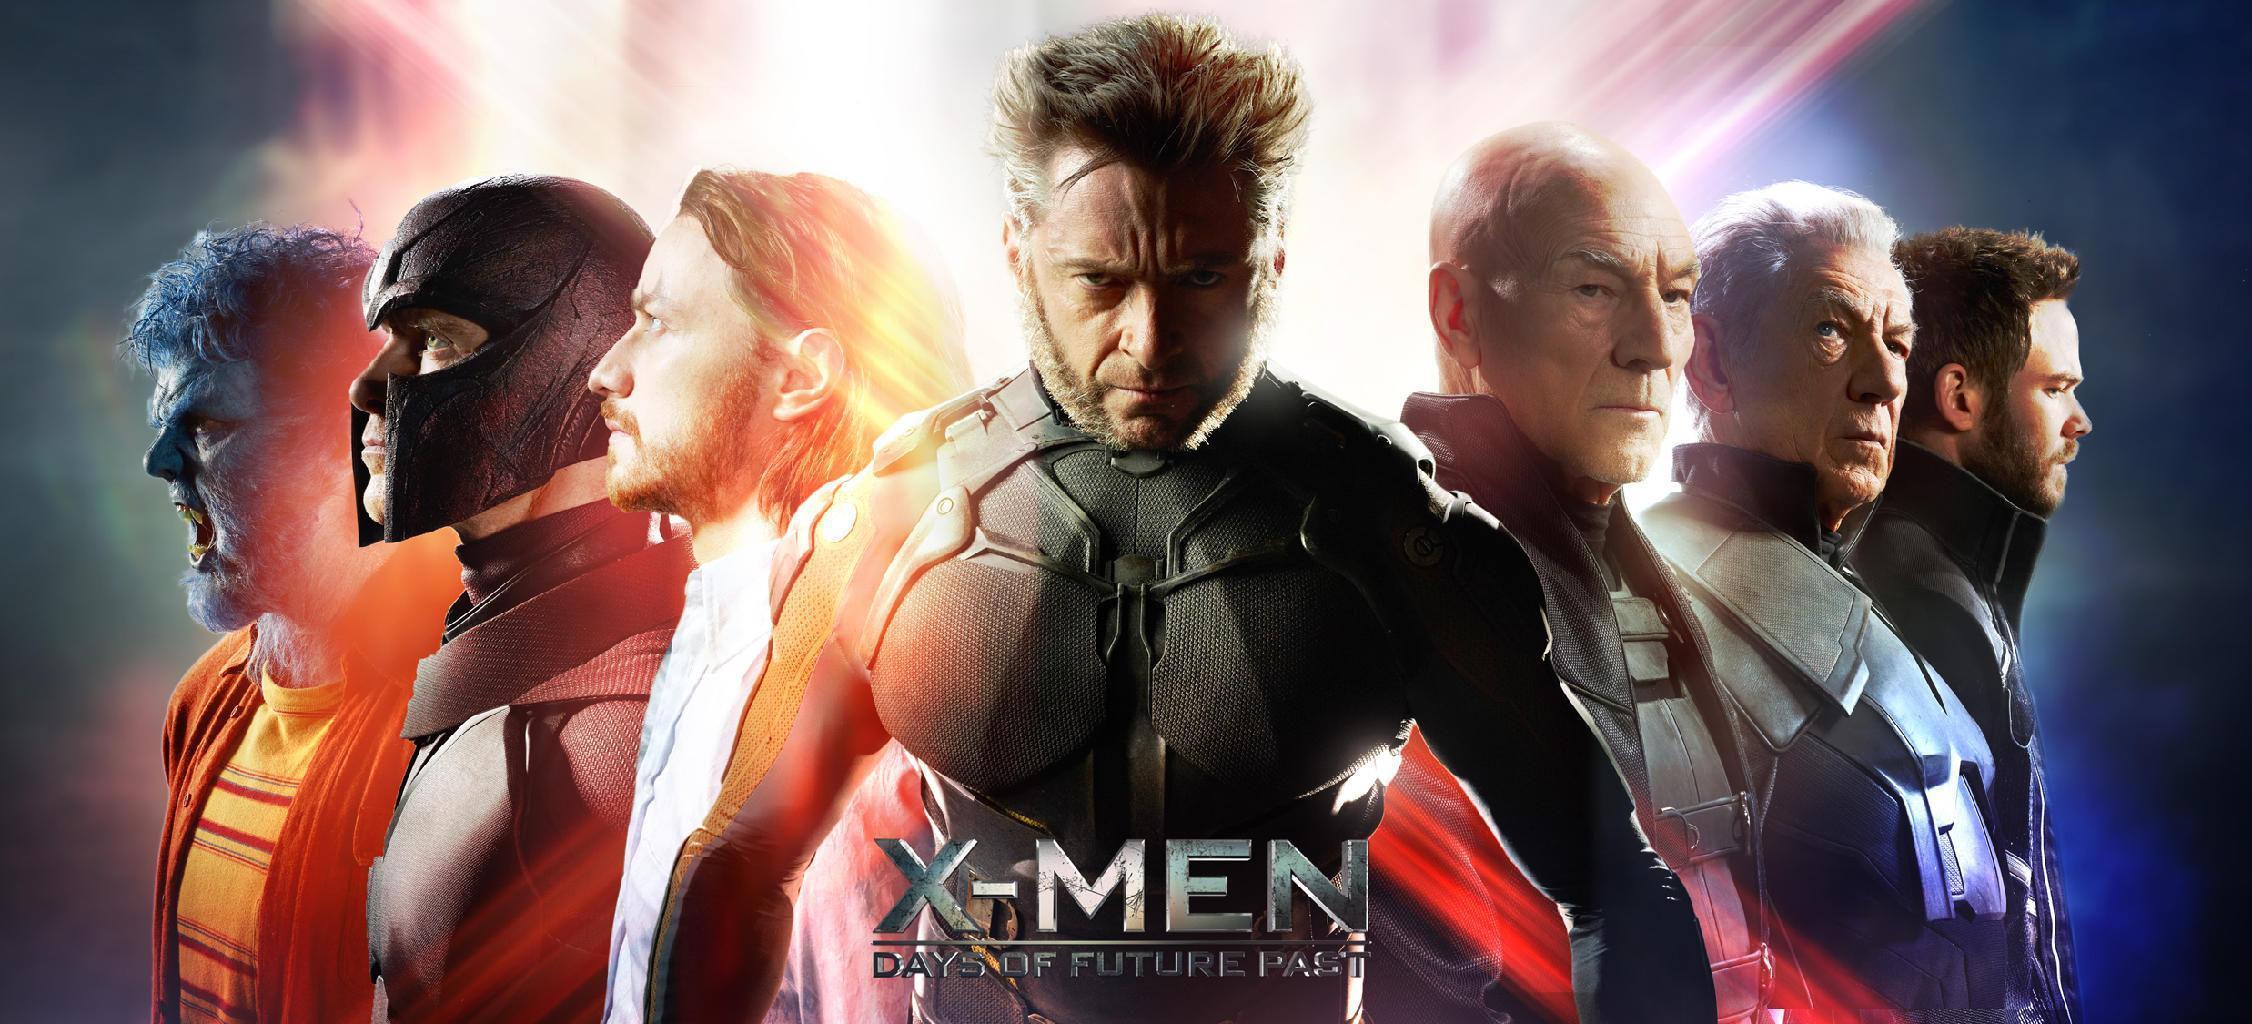 X-Men: Days of Future Past cestovanie časom